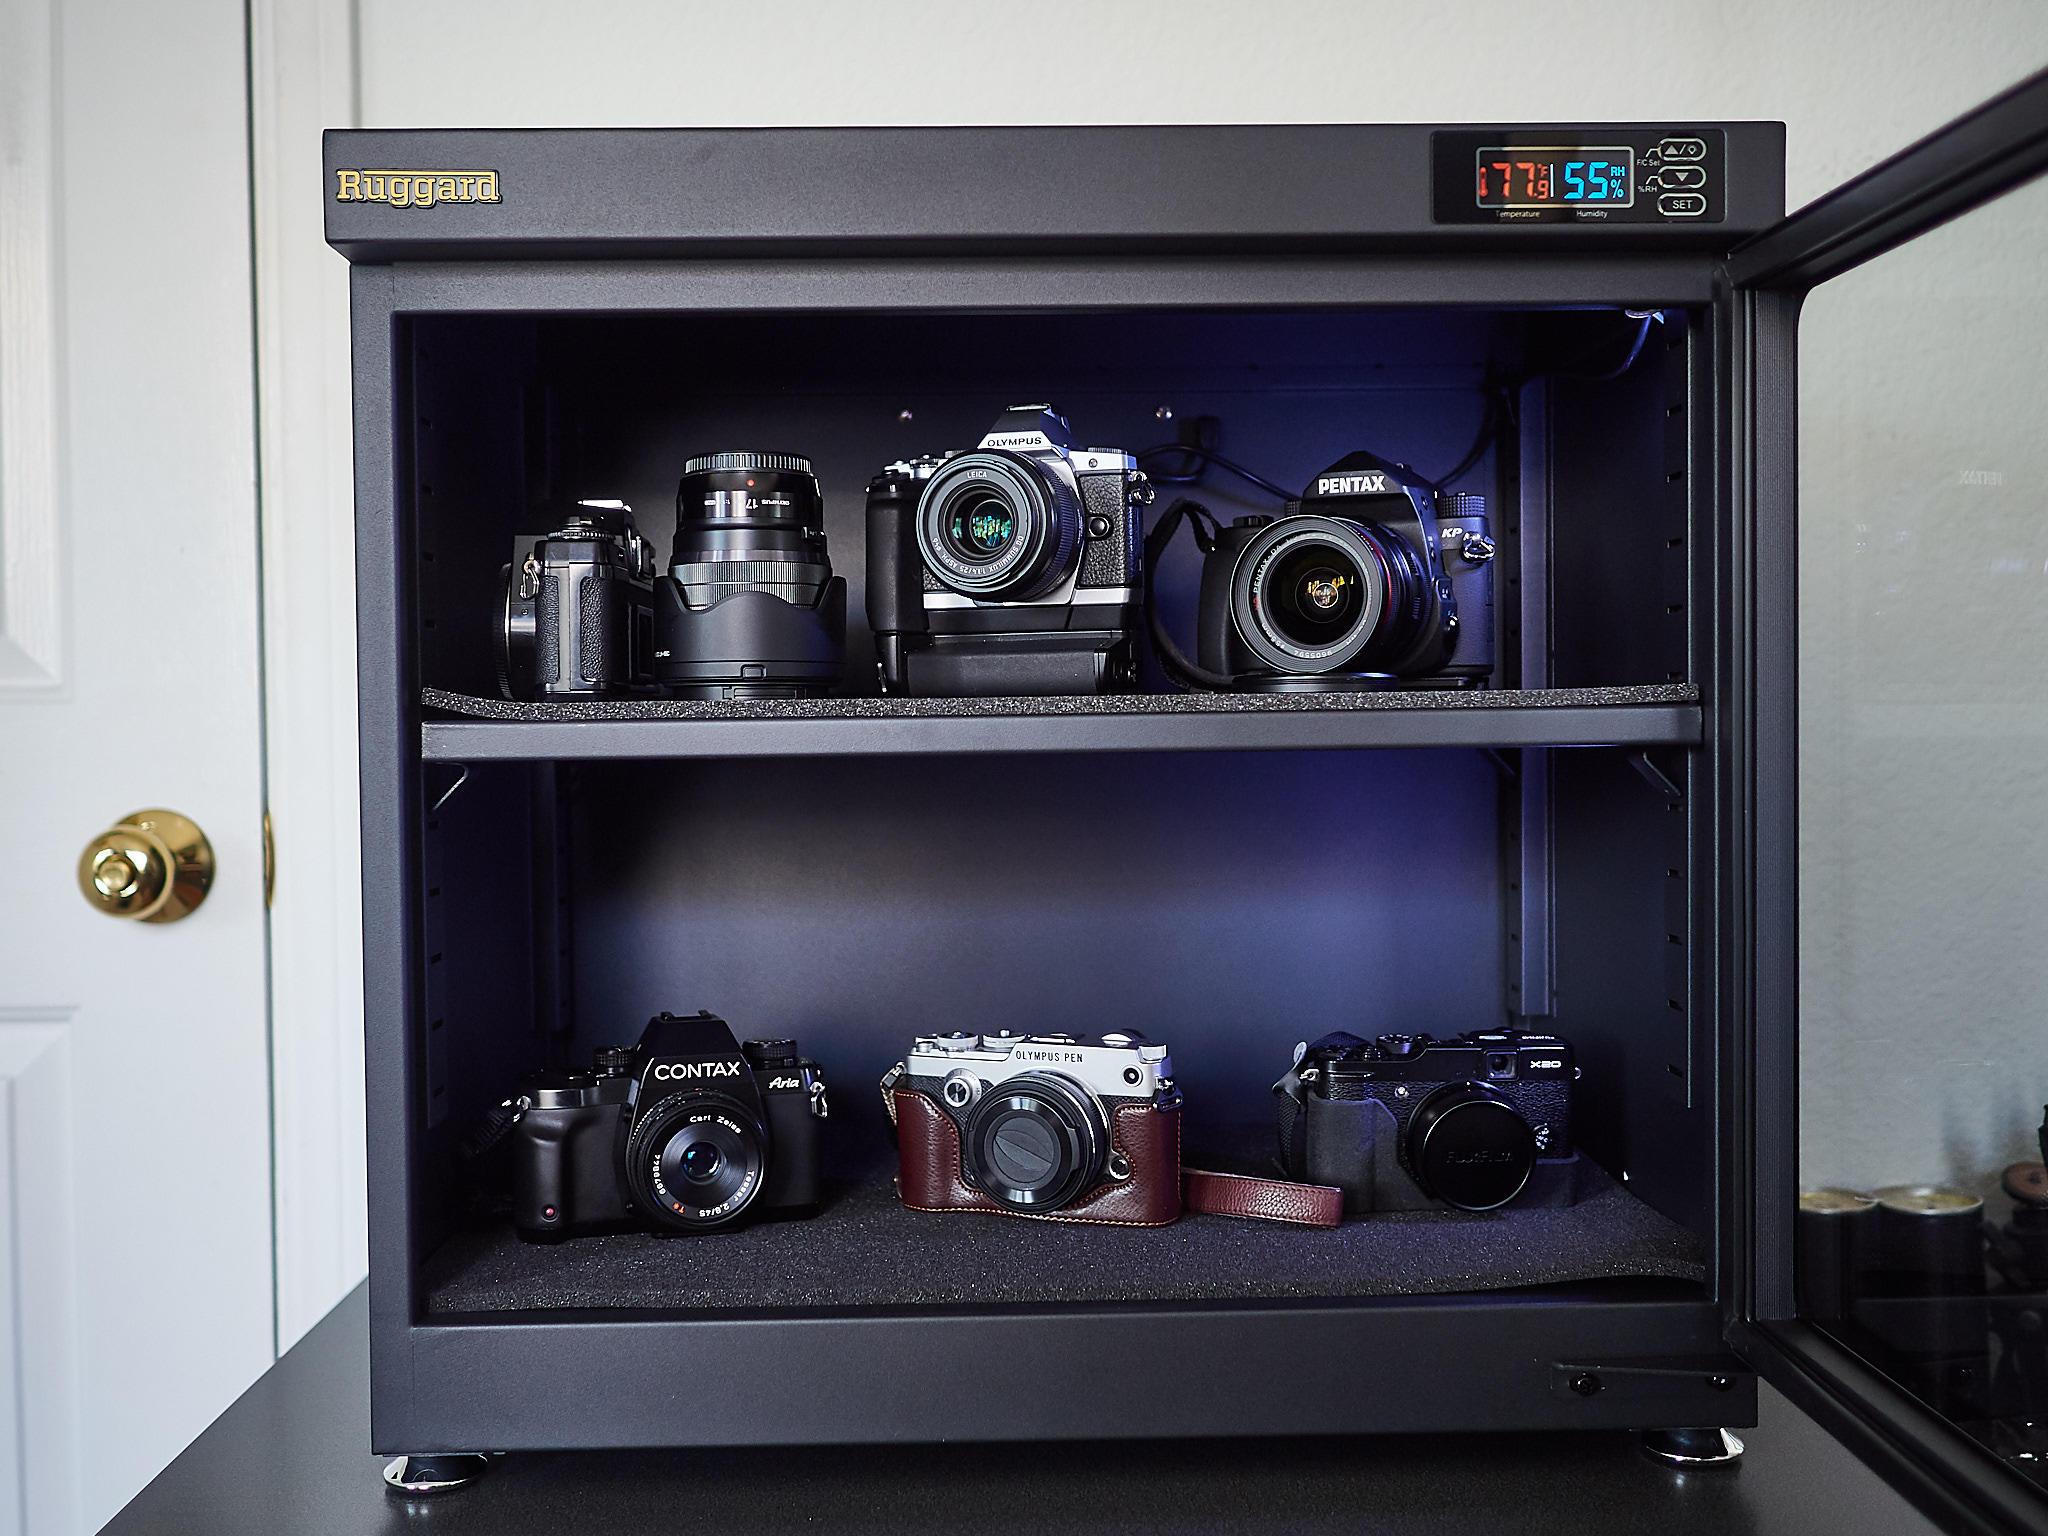 http://thedigitalstory.com/2018/06/22/P6201395-dry-cabinet-web.jpg